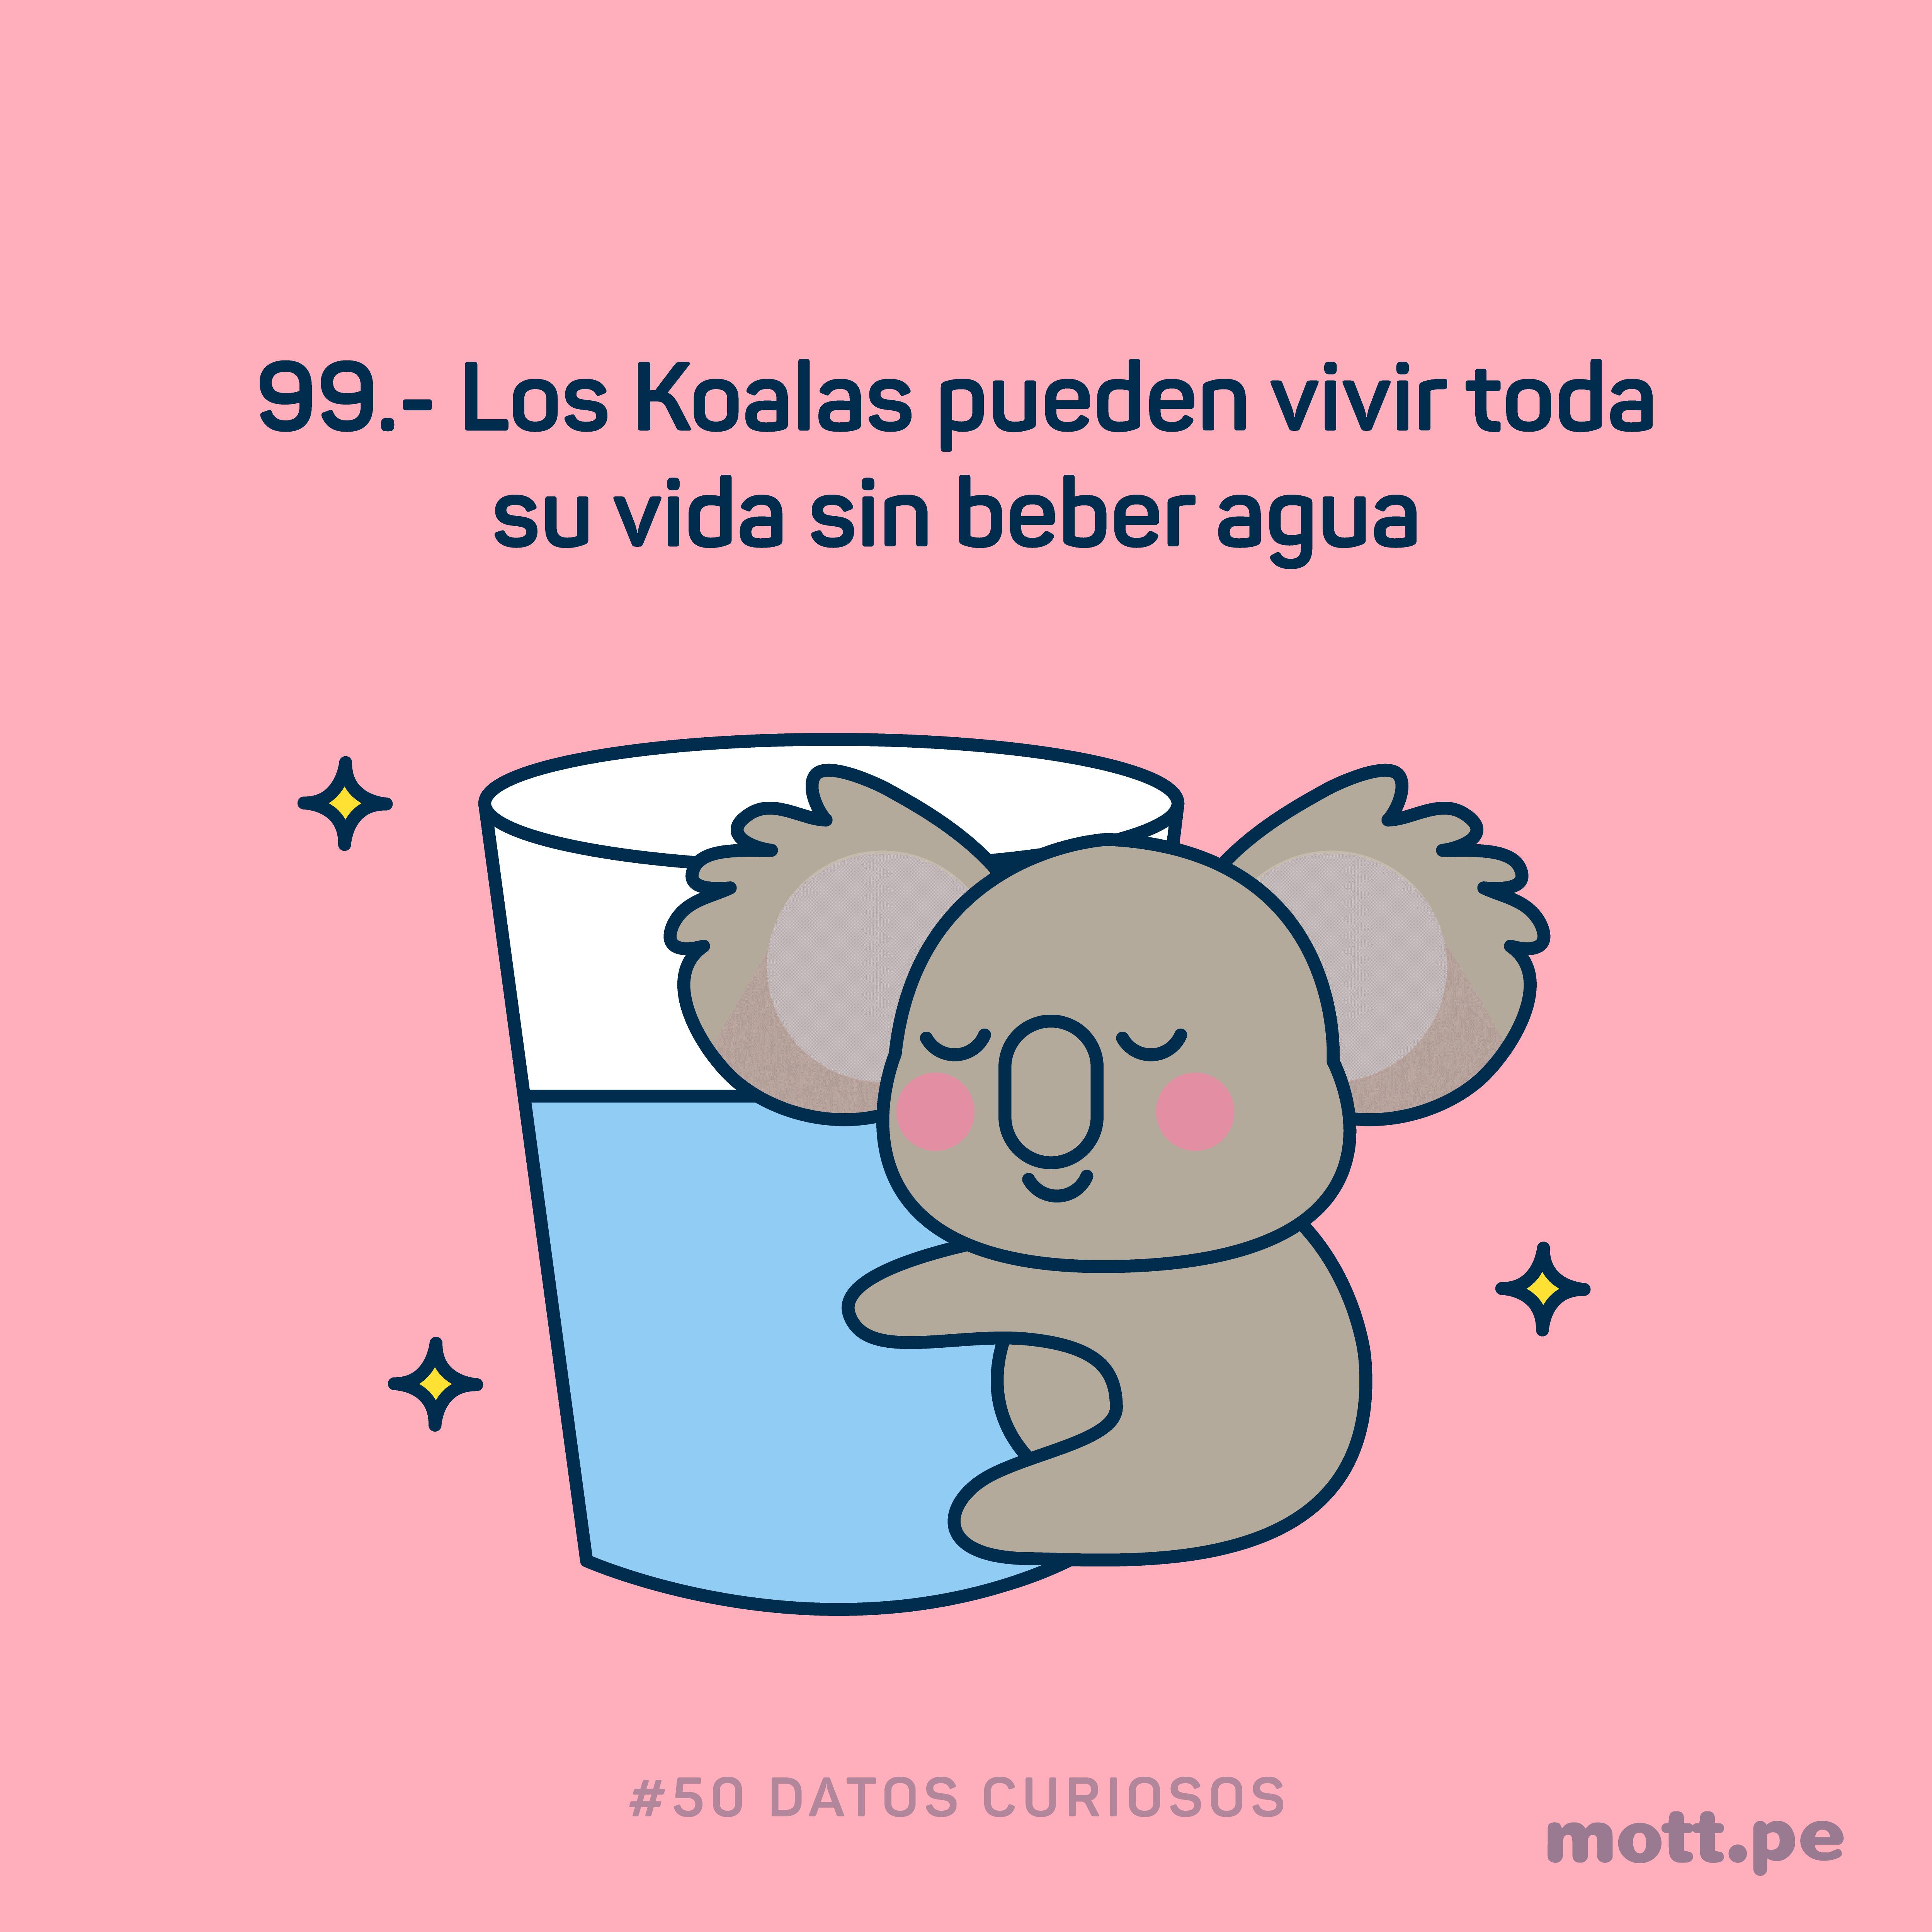 el koala puede vivir sin beber agua